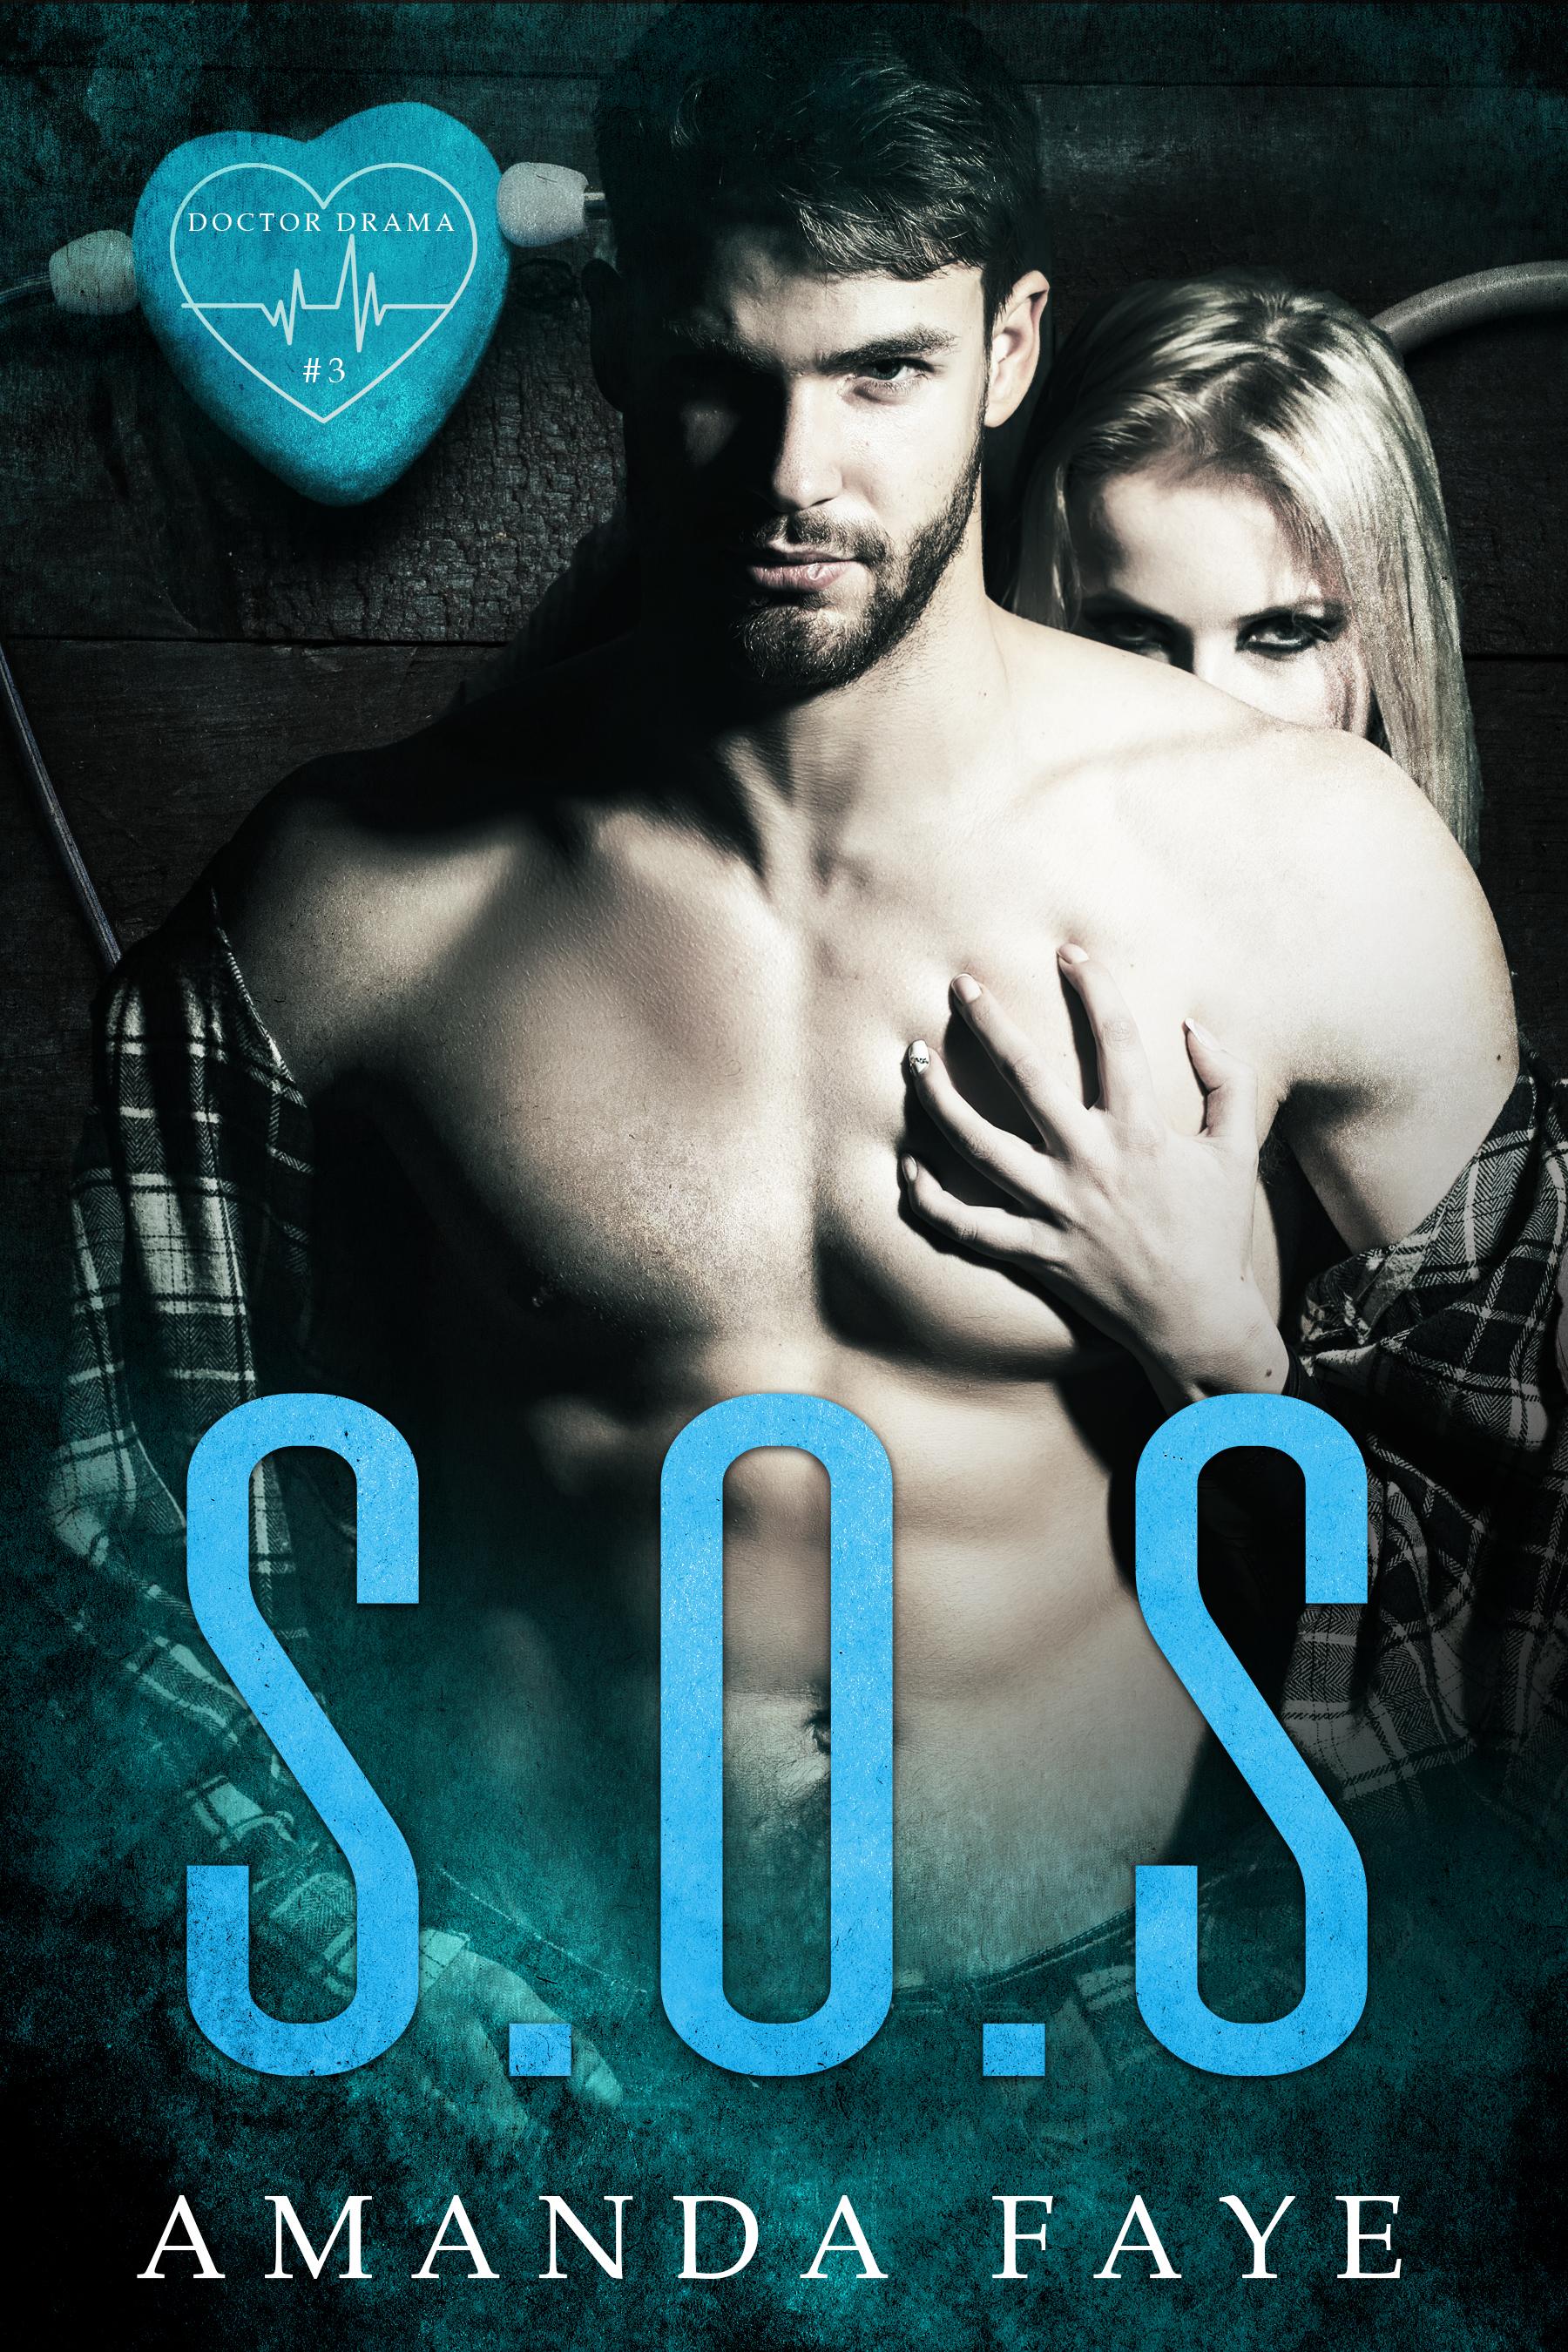 S.O.S. (Doctor Drama #3)